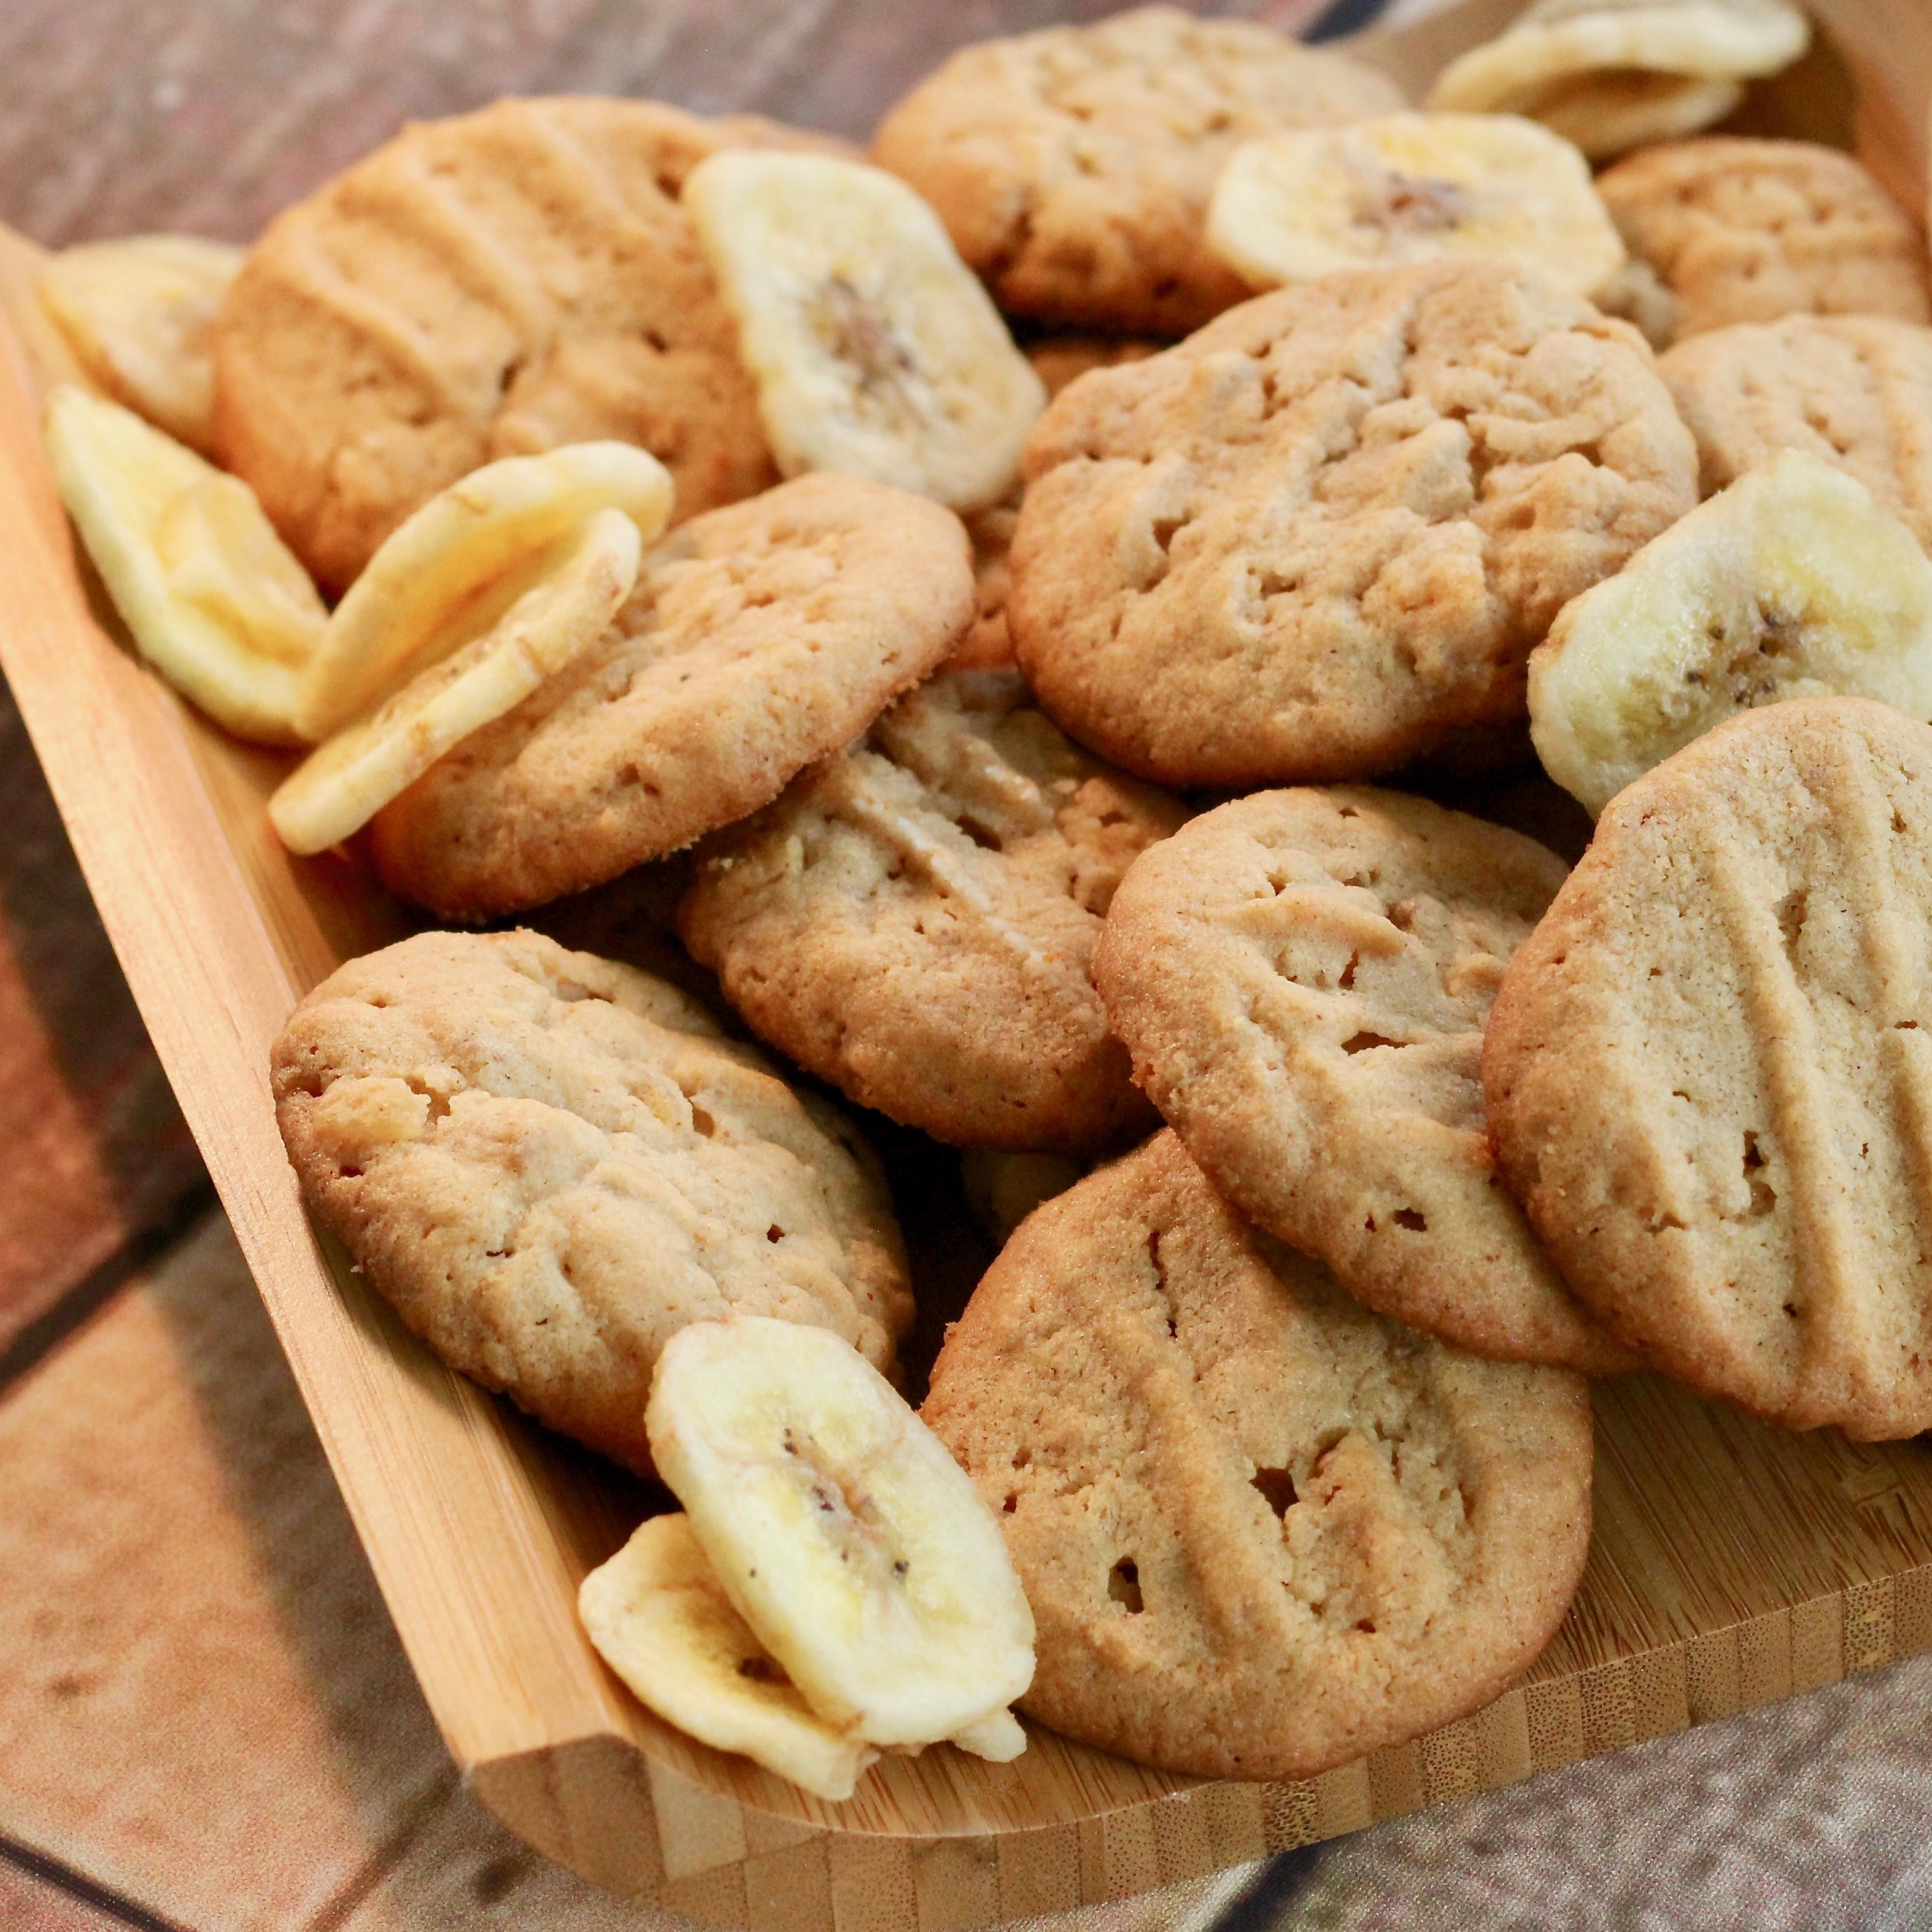 Peanut Butter Banana Chip Cookies